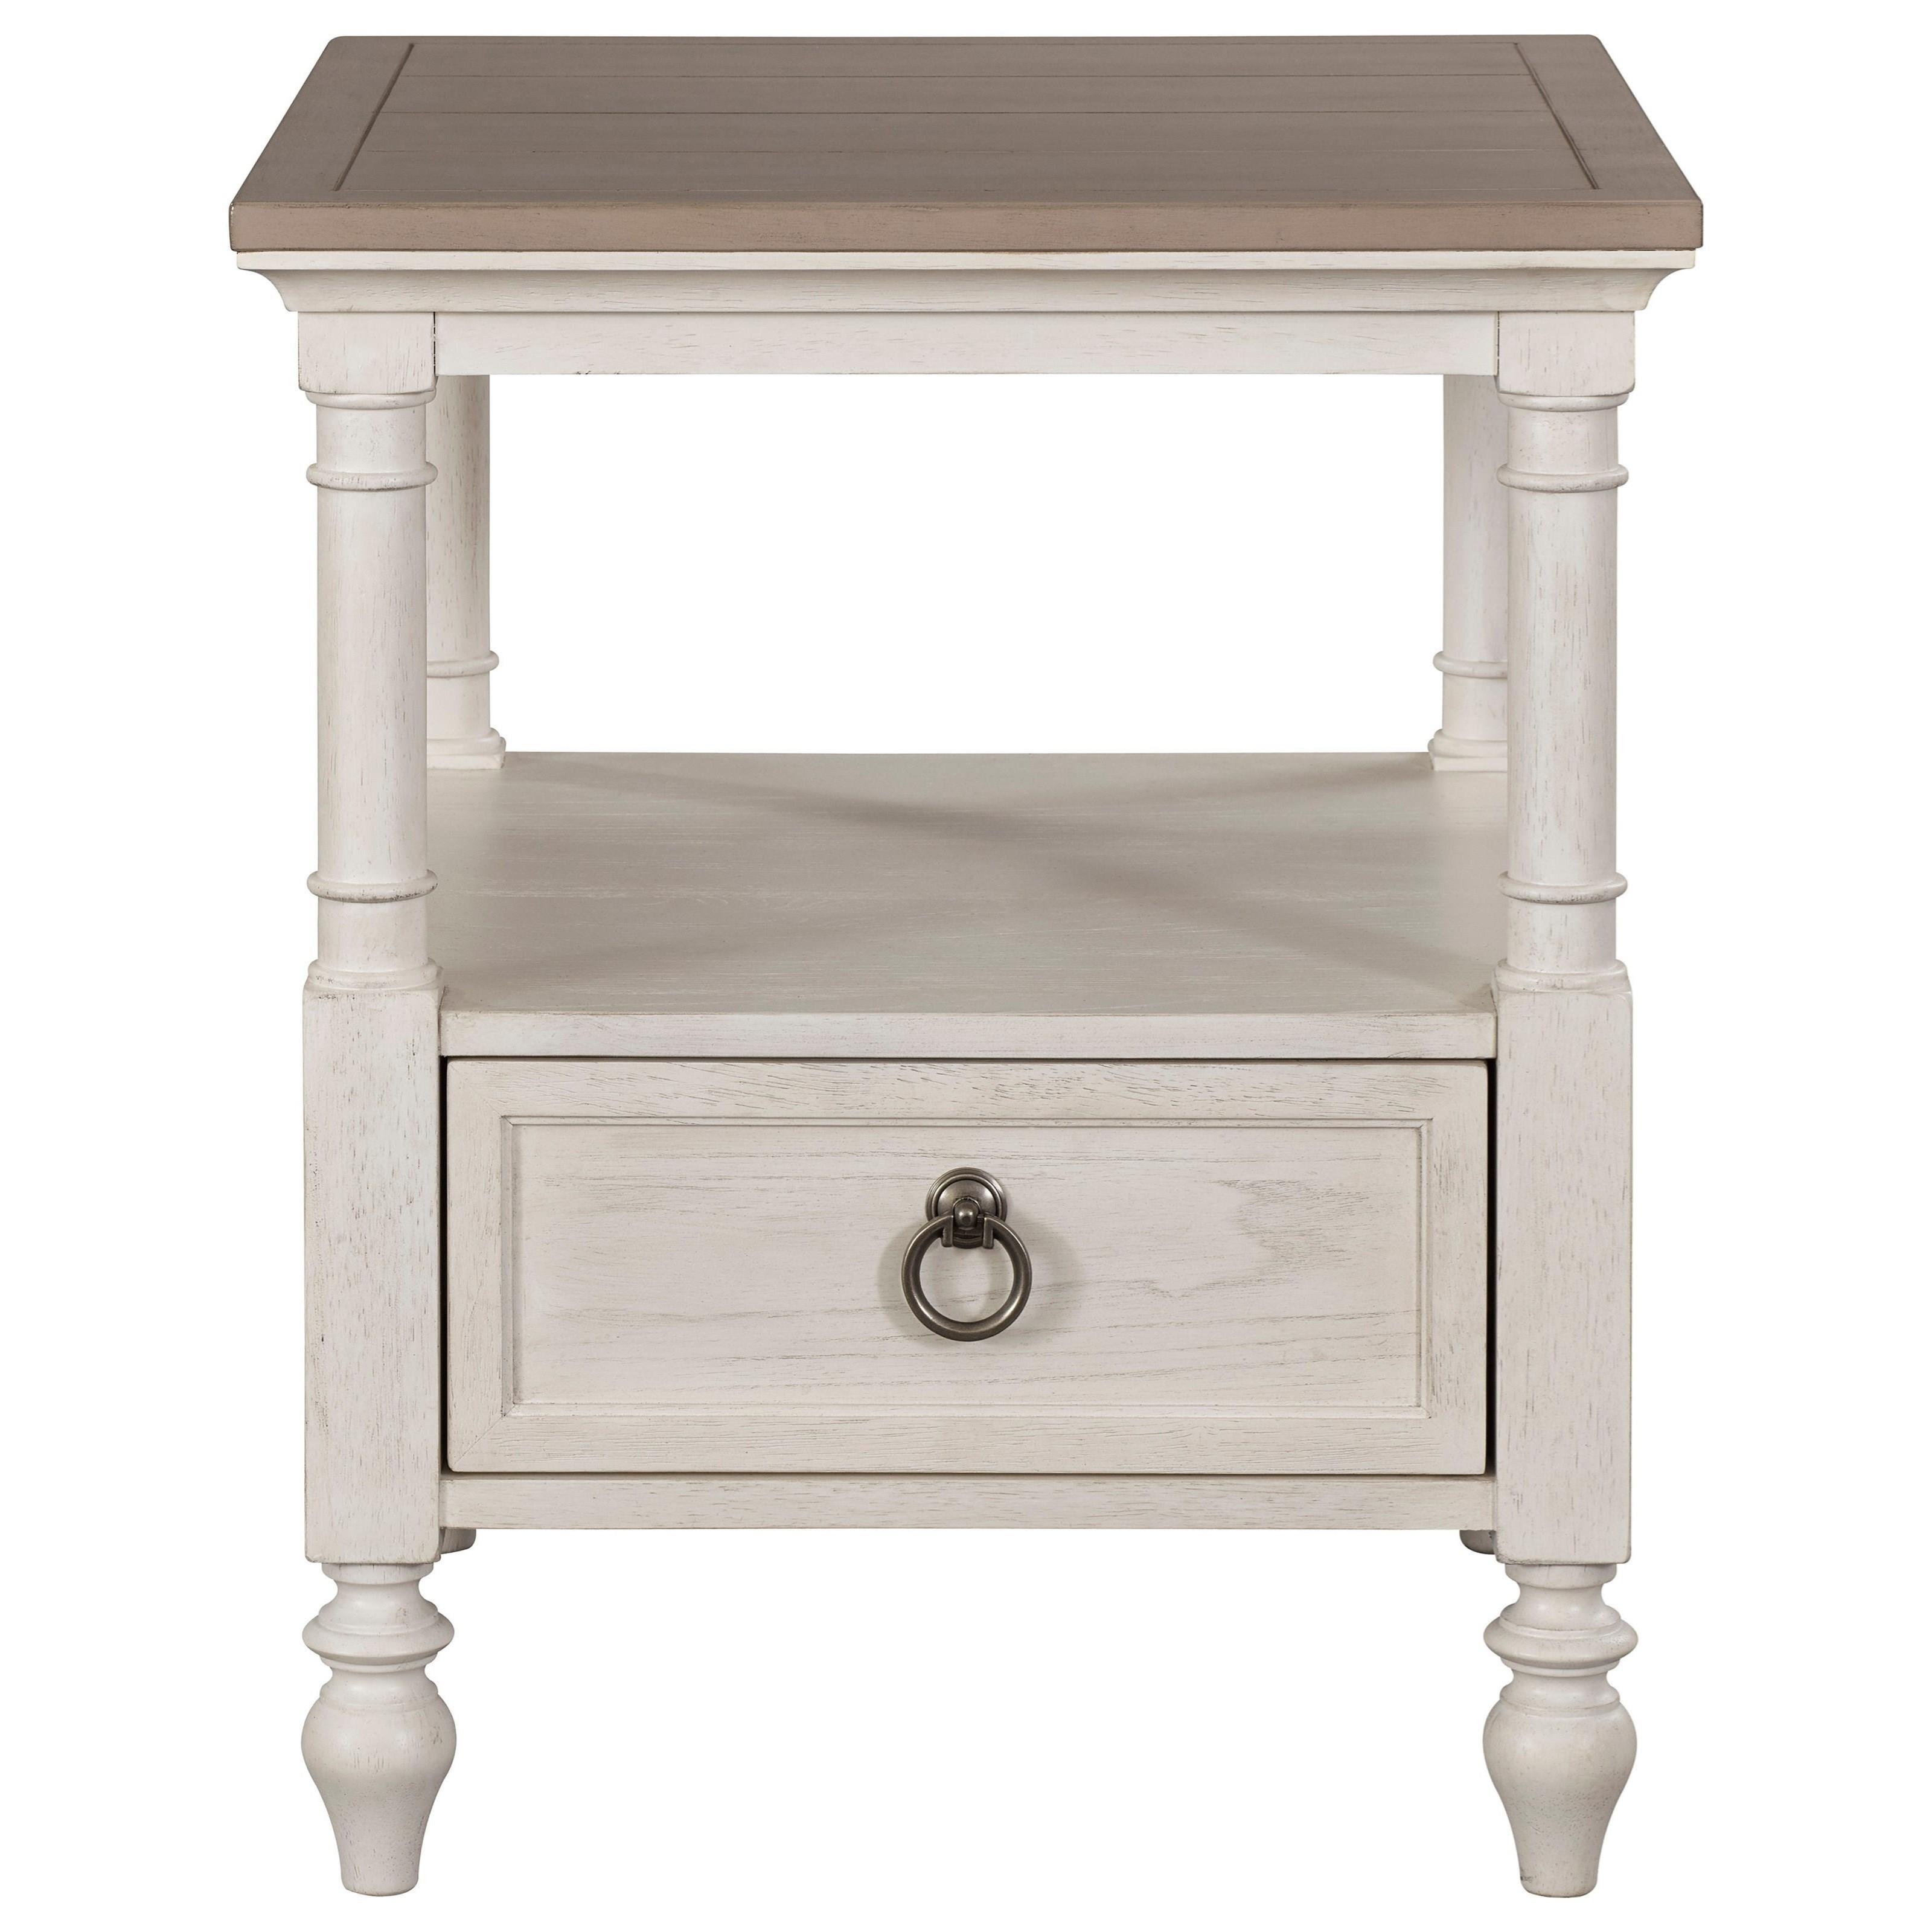 Broyhill Furniture Ashgrove 4547 002WH PU Transitional 1